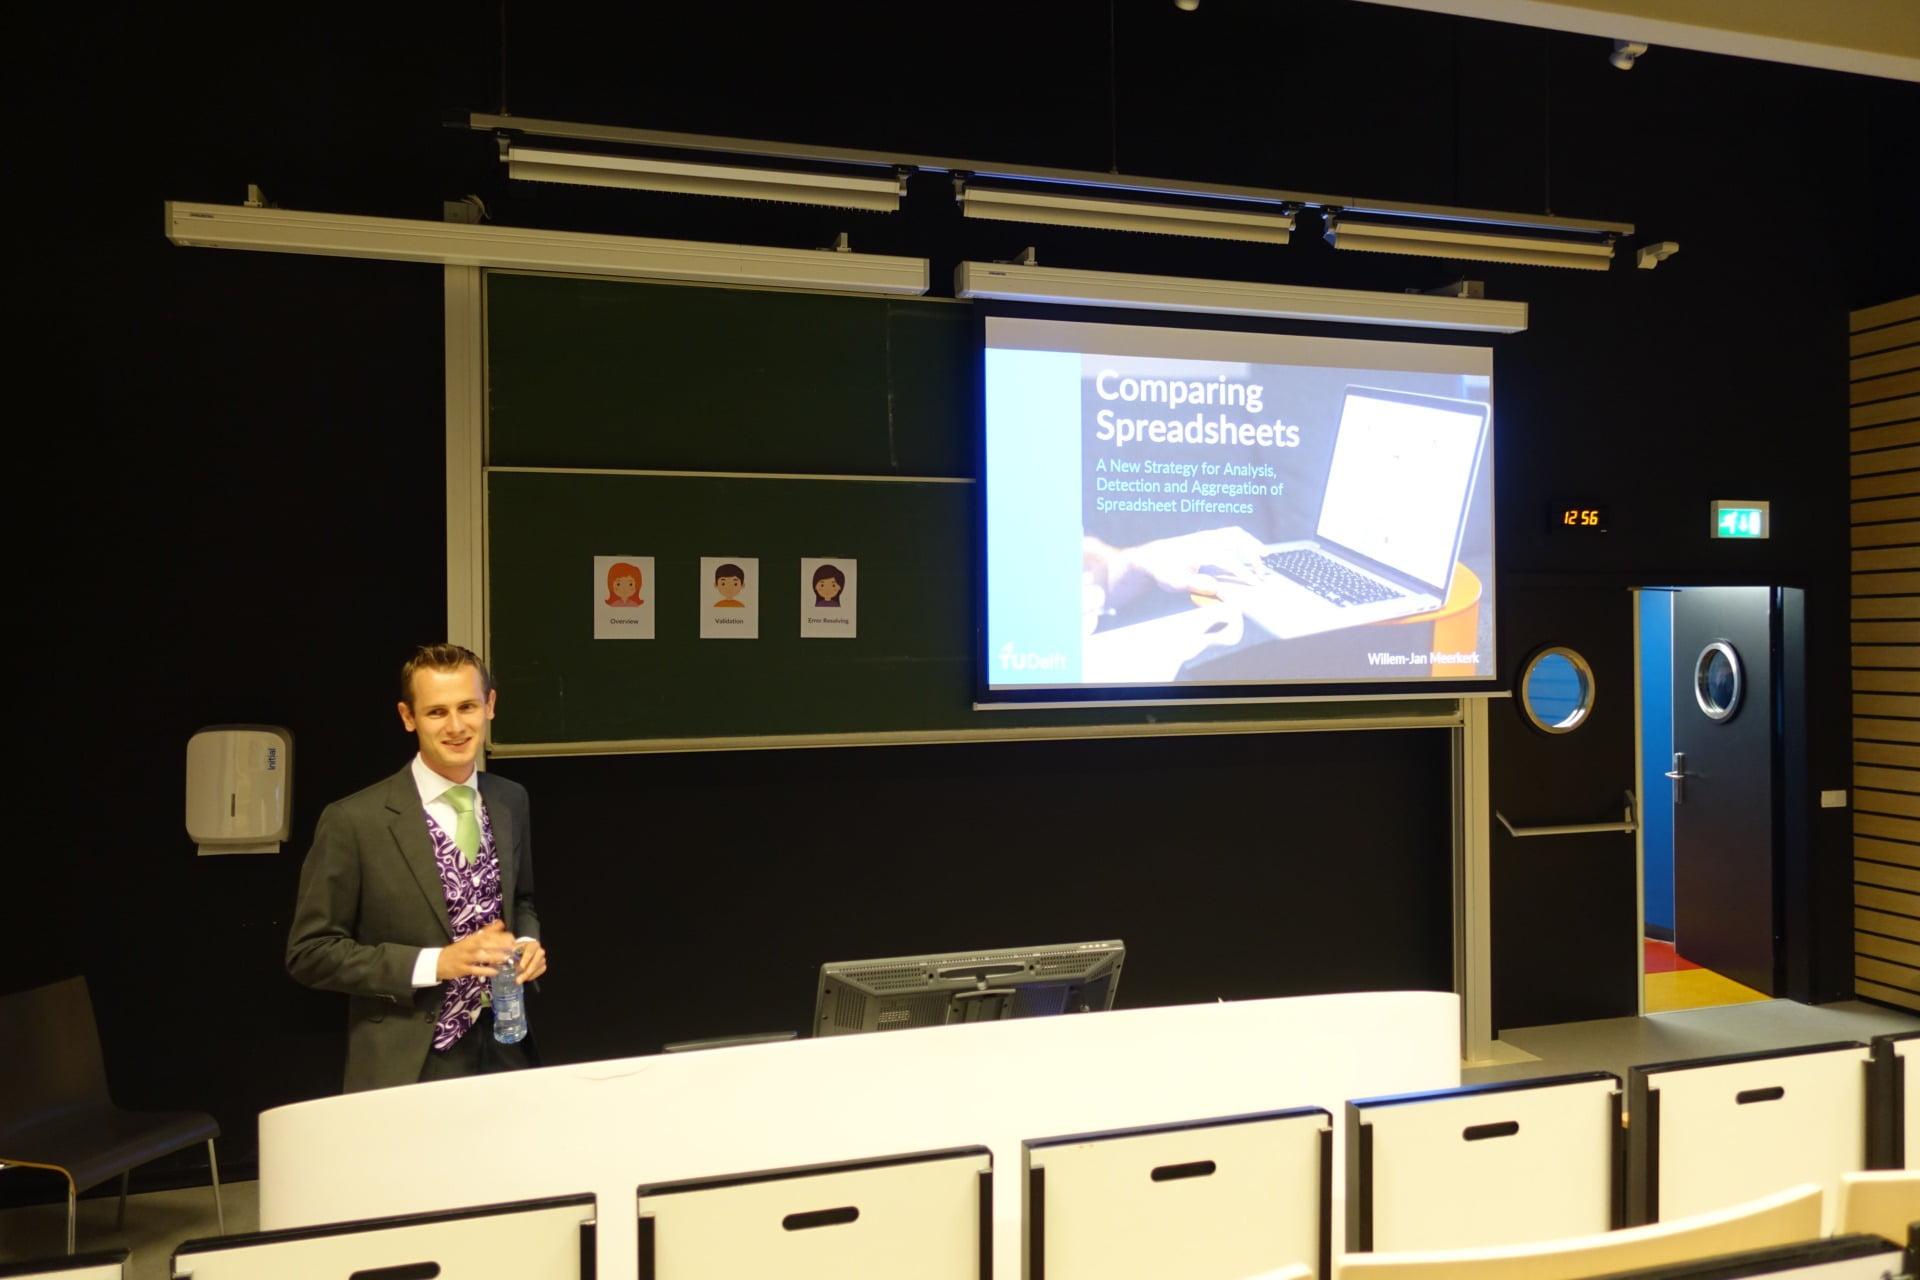 Willem-Jan Presenting PerfectXL Explore // PerfectXL